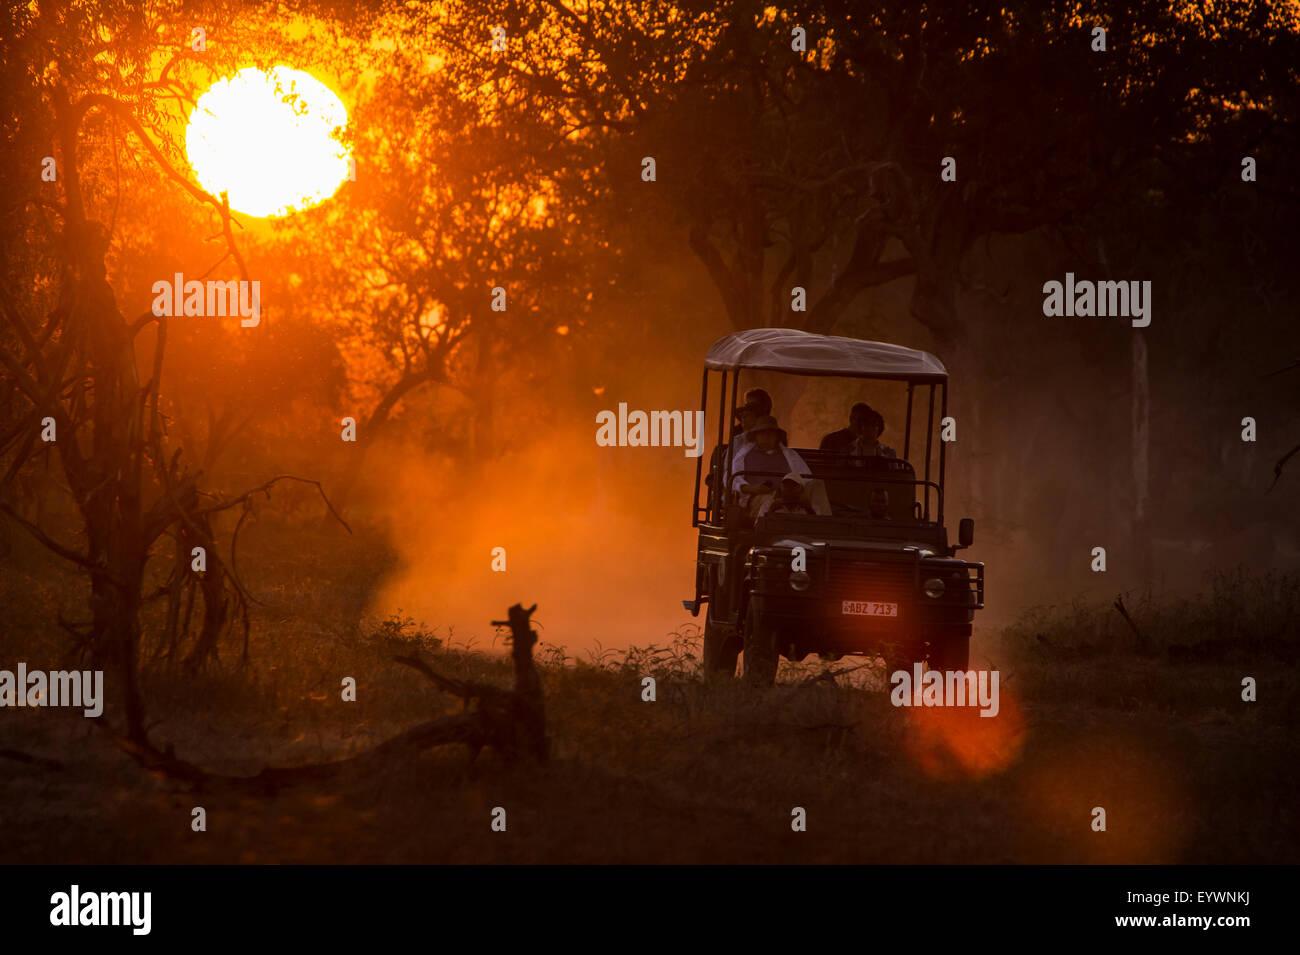 Jeep bei Gegenlicht bei Sonnenuntergang, South Luangwa Nationalpark, Sambia, Afrika Stockbild